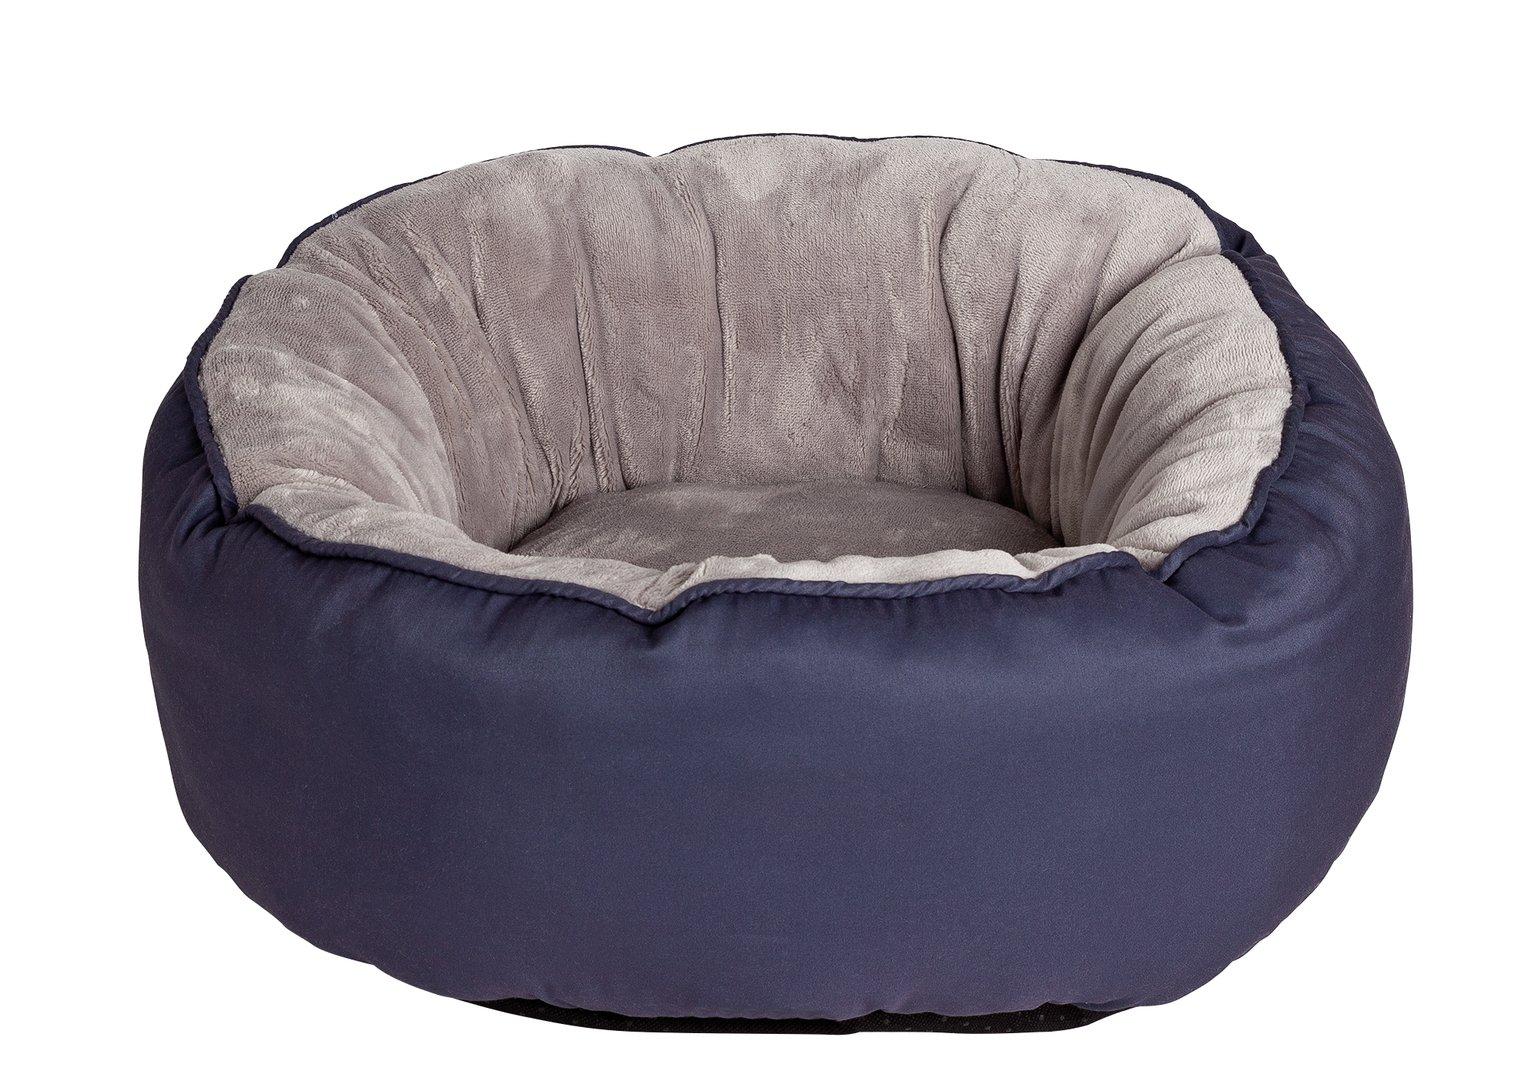 King Pets Grey Snuggle Donut